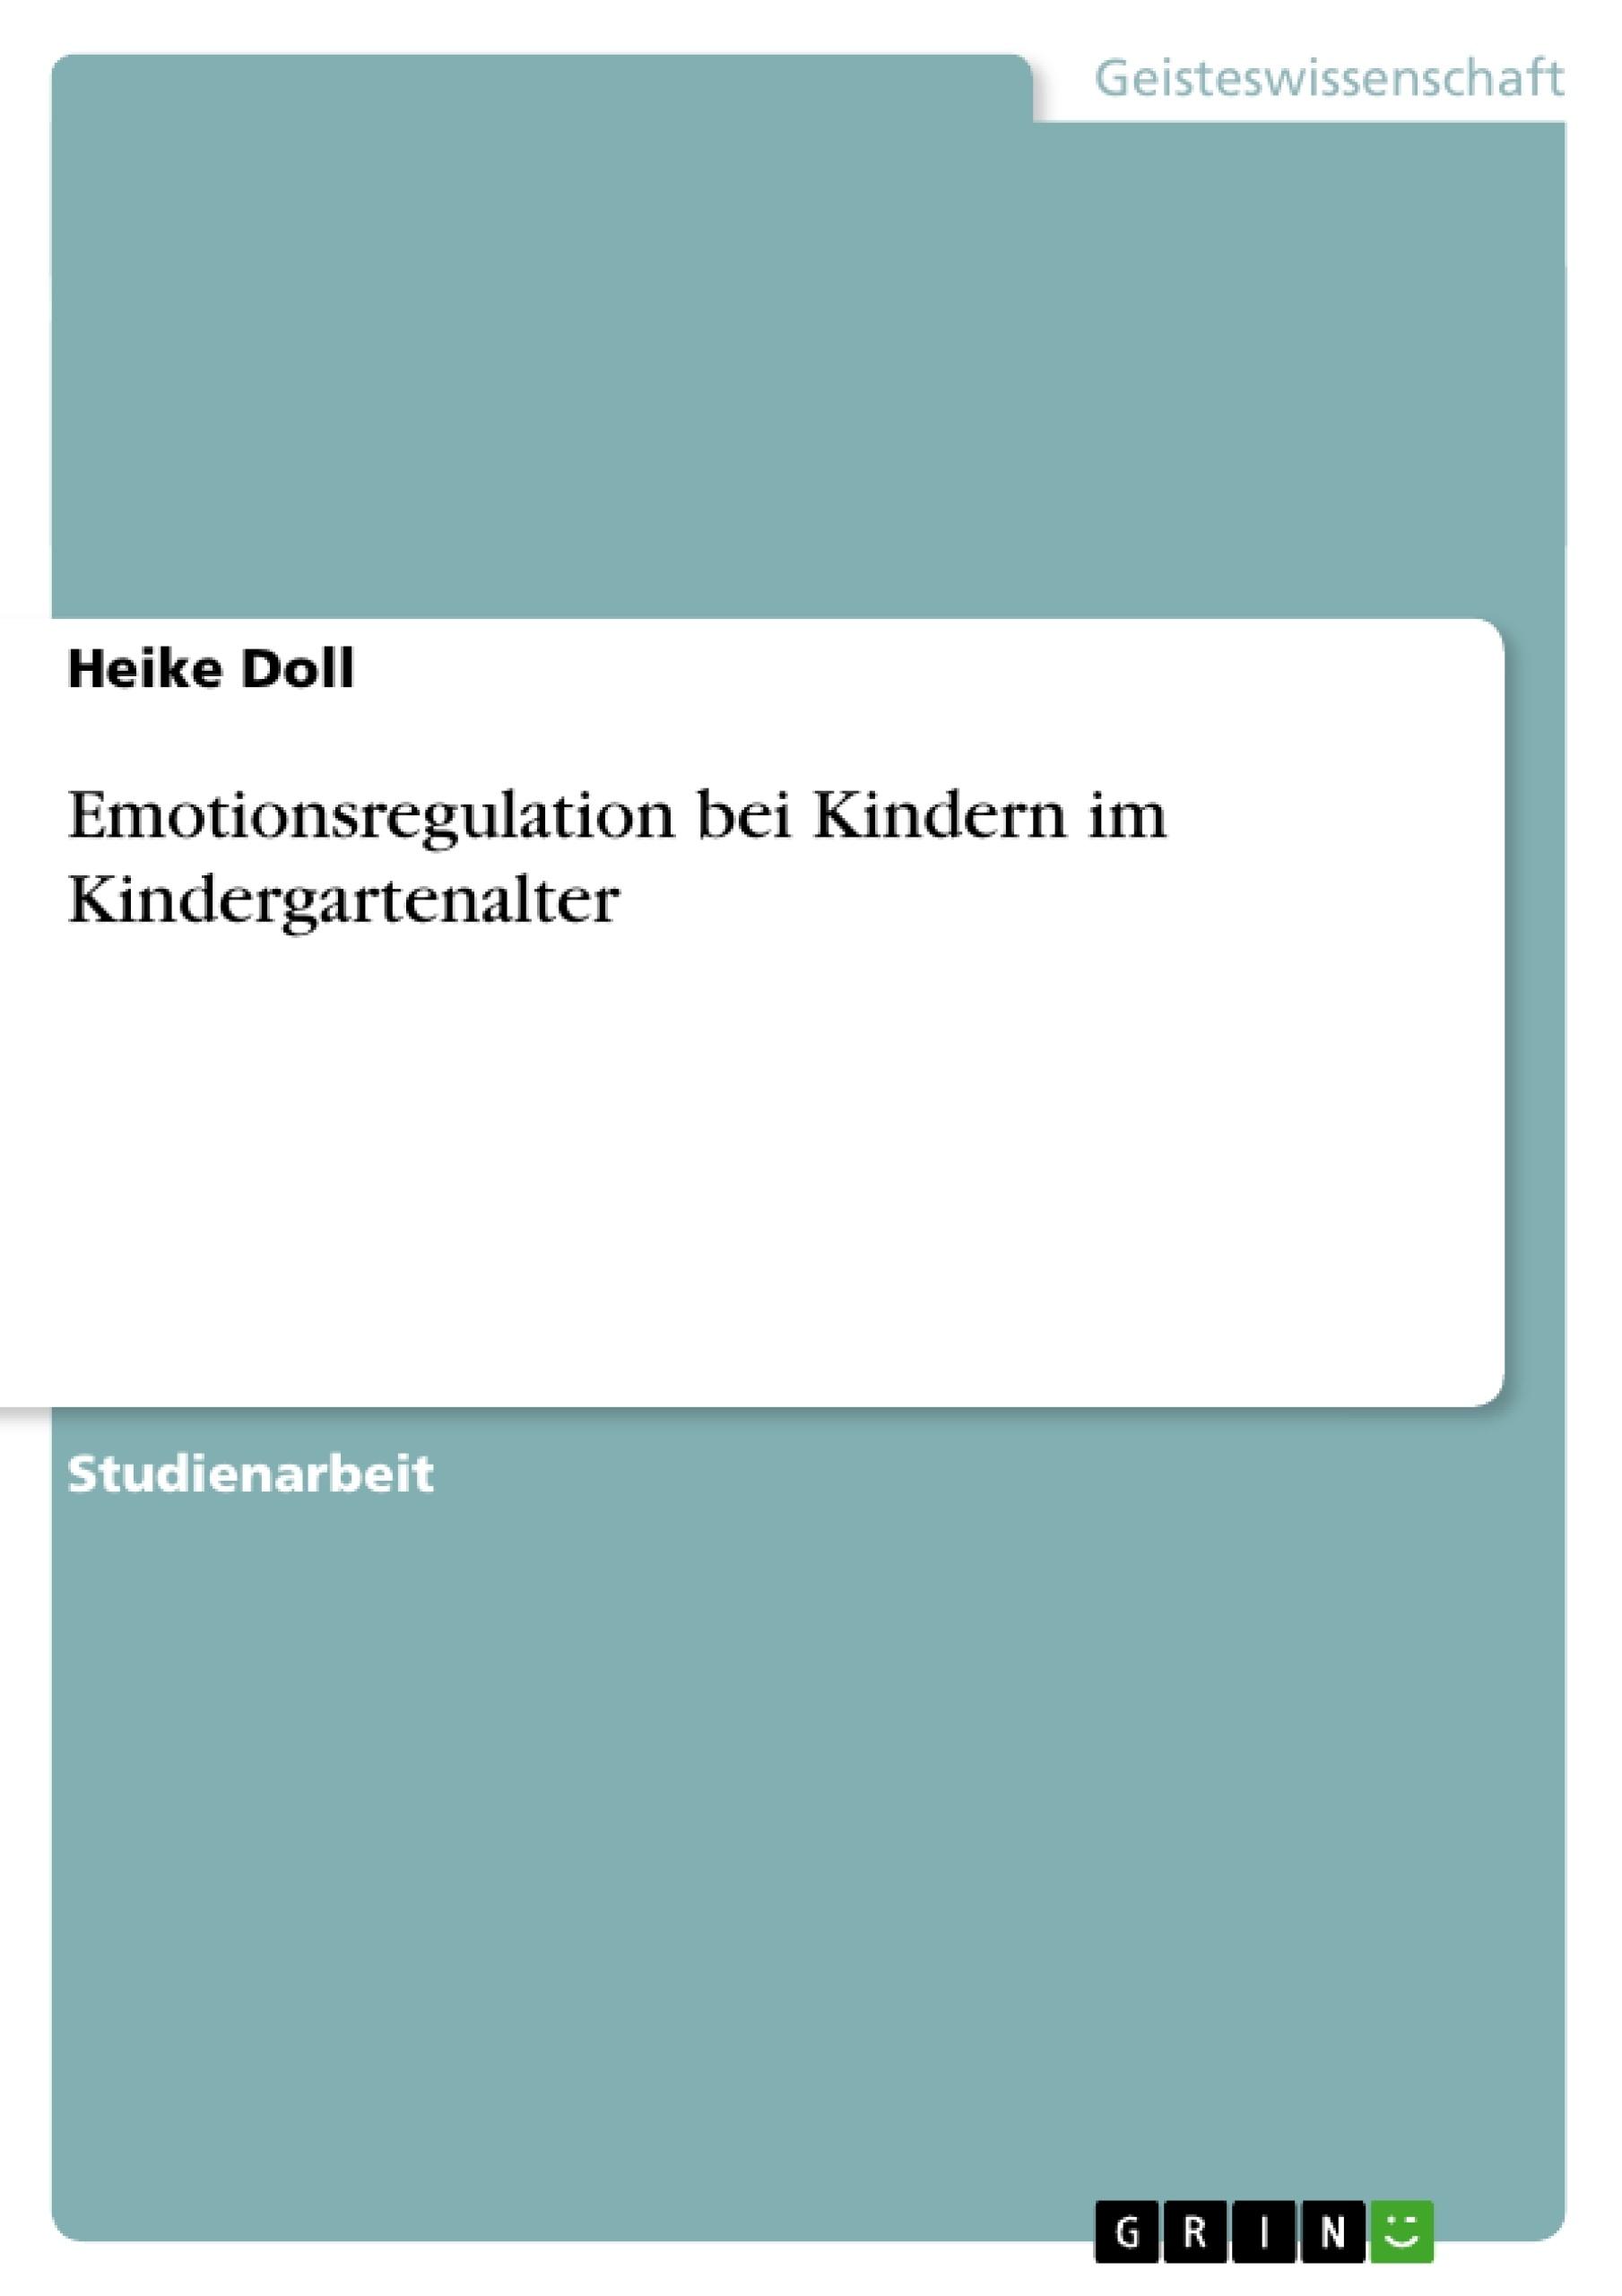 Titel: Emotionsregulation bei Kindern im Kindergartenalter